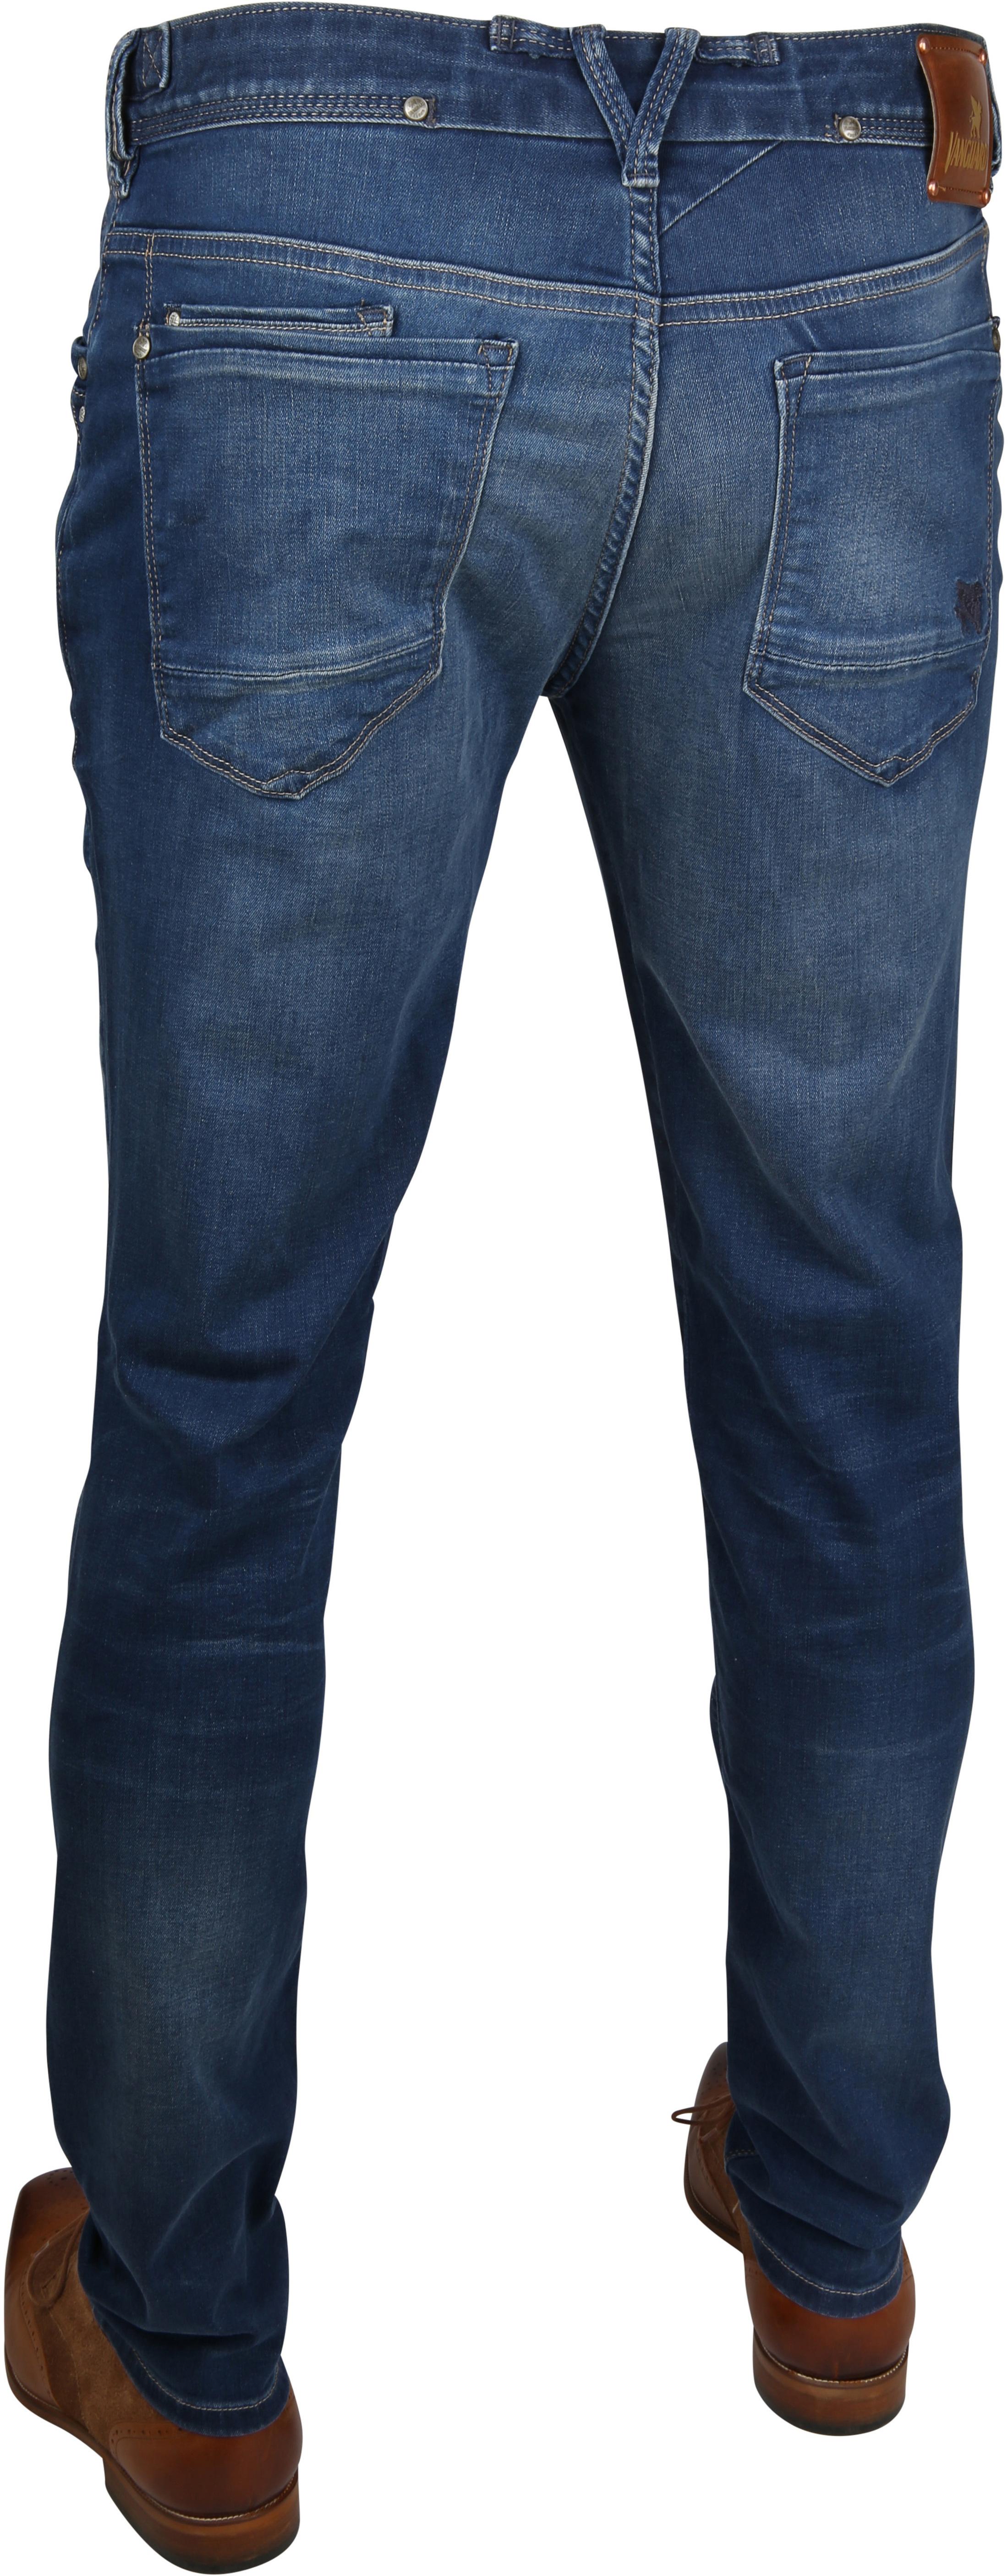 Vanguard V8 Racer Blauw Jeans foto 3